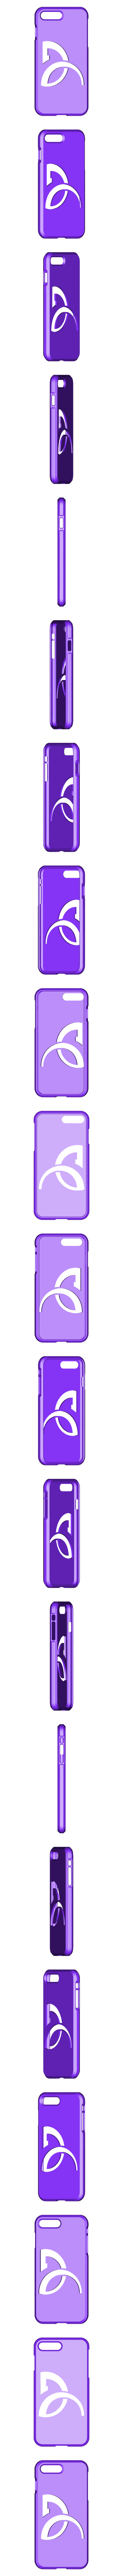 Novak Djokovic.stl Download STL file Iphone 4 Covers • 3D printable template, vincent91100